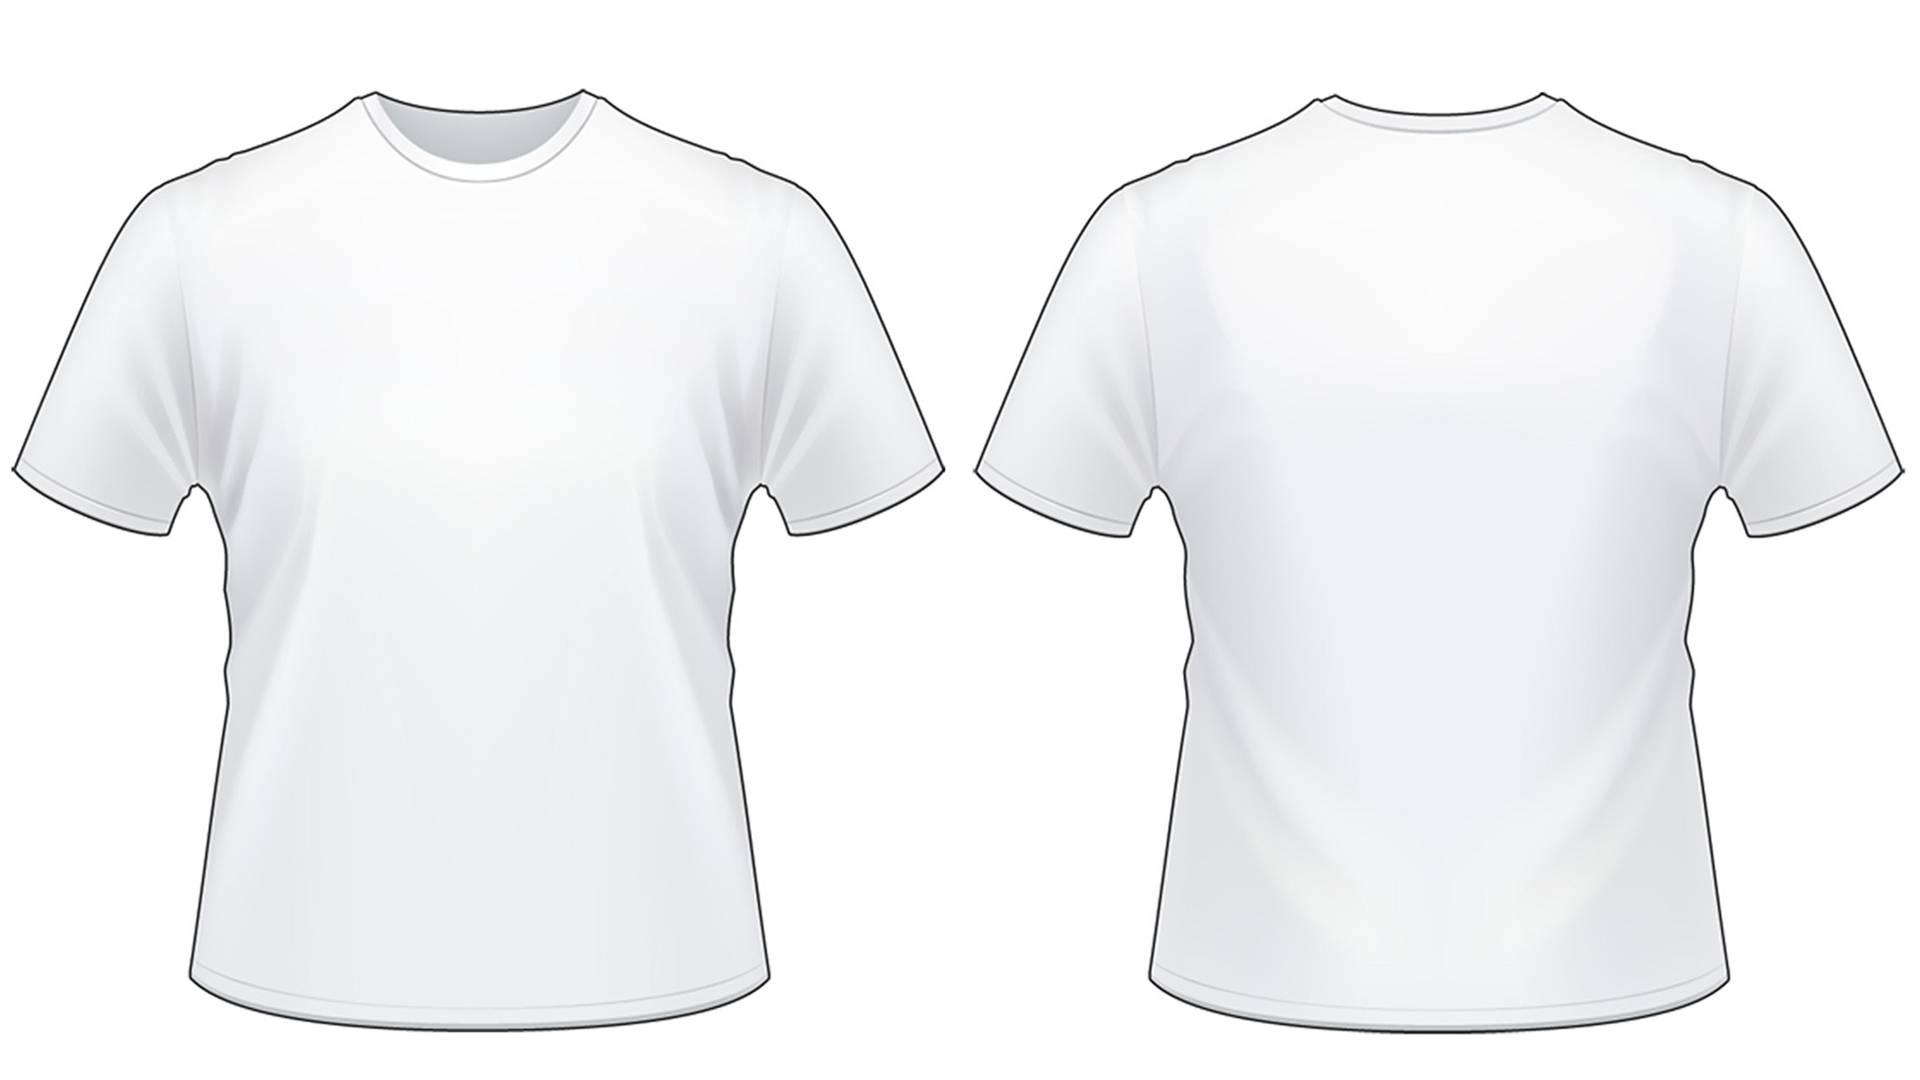 T Shirt Design Template Png